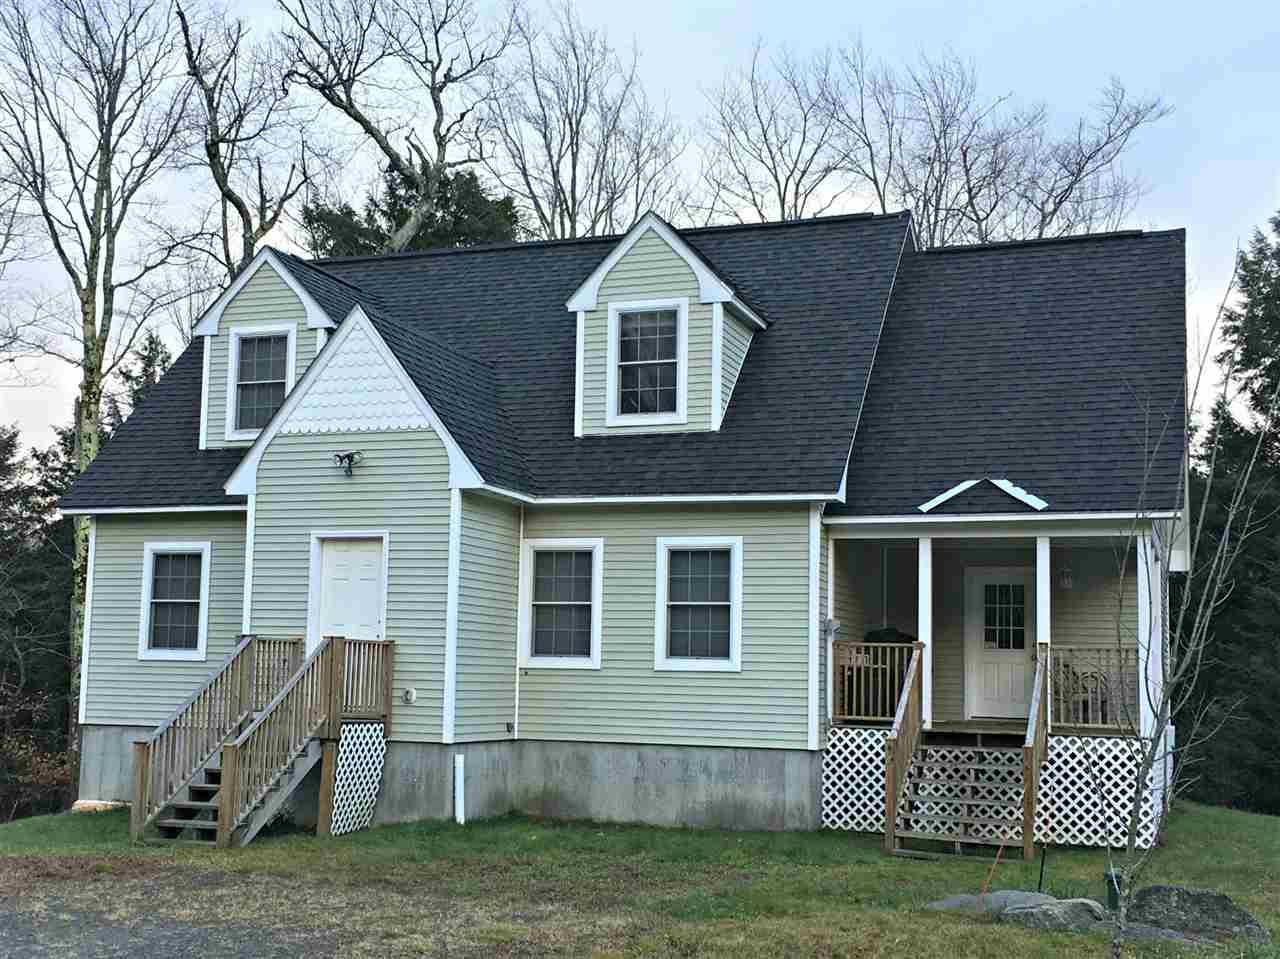 Mount-Snow-Real-Estate-4607925-1